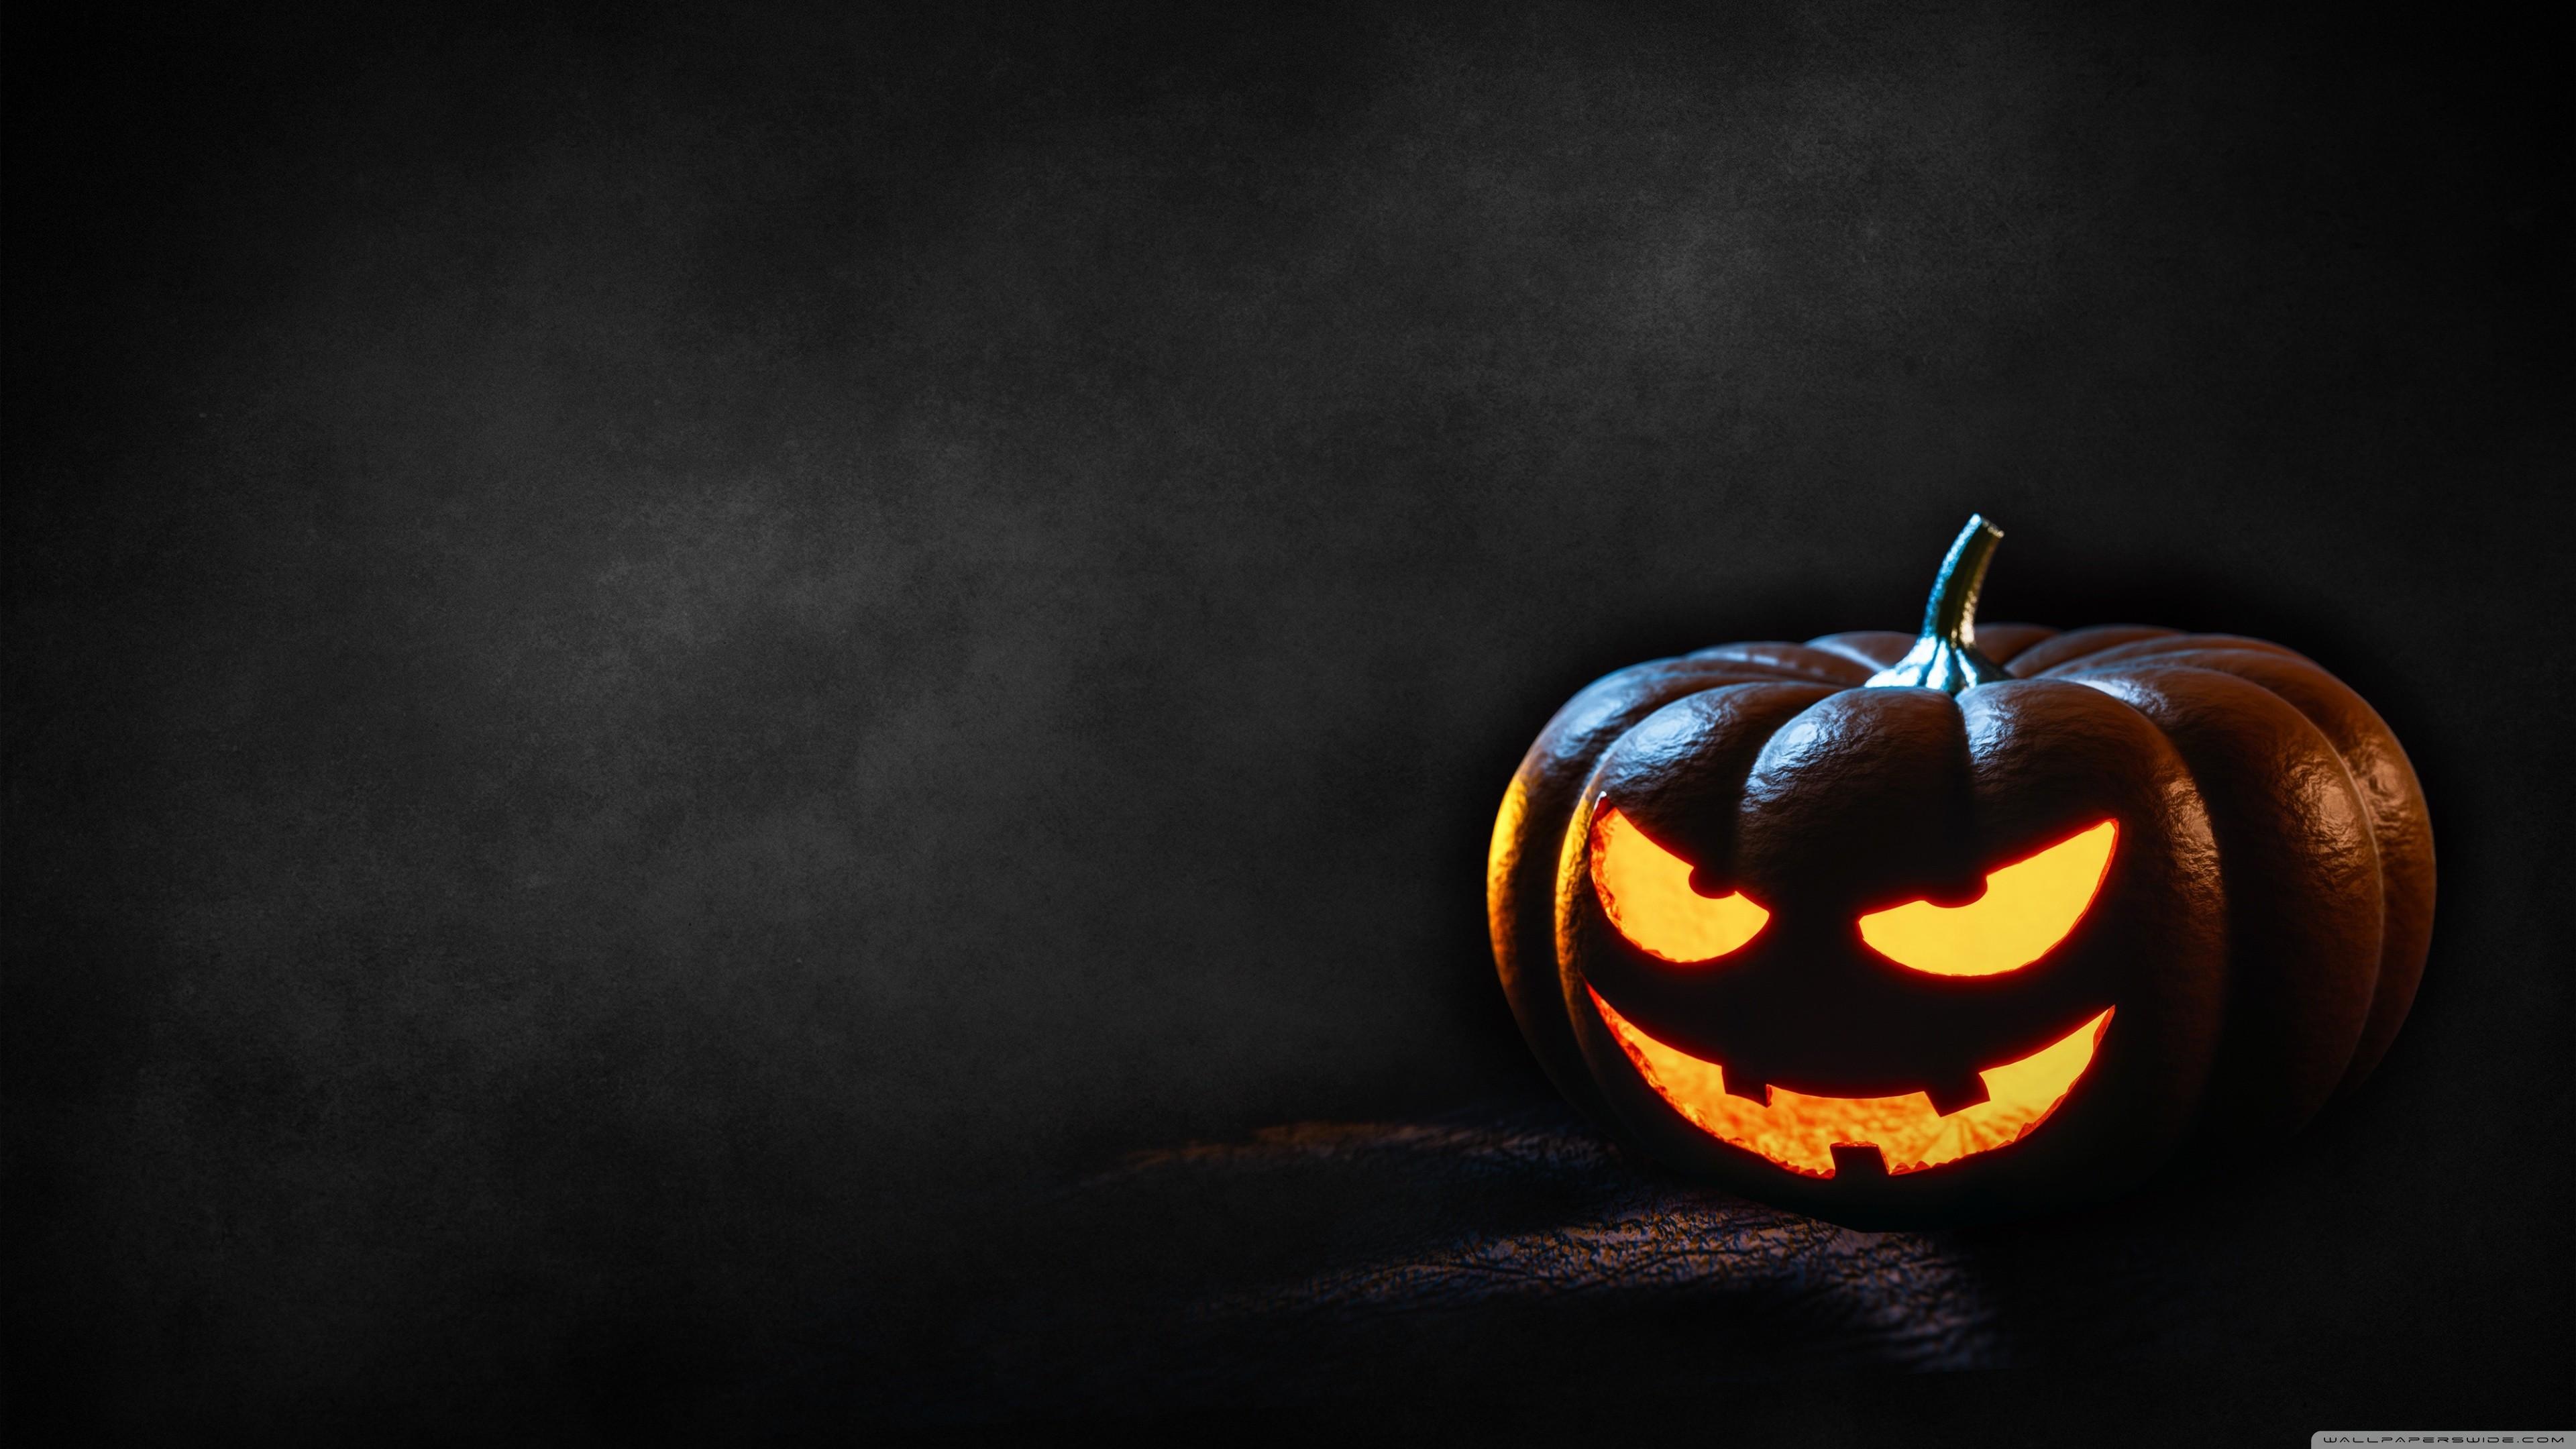 Cute halloween desktop wallpaper 61 images - Free widescreen halloween wallpaper ...